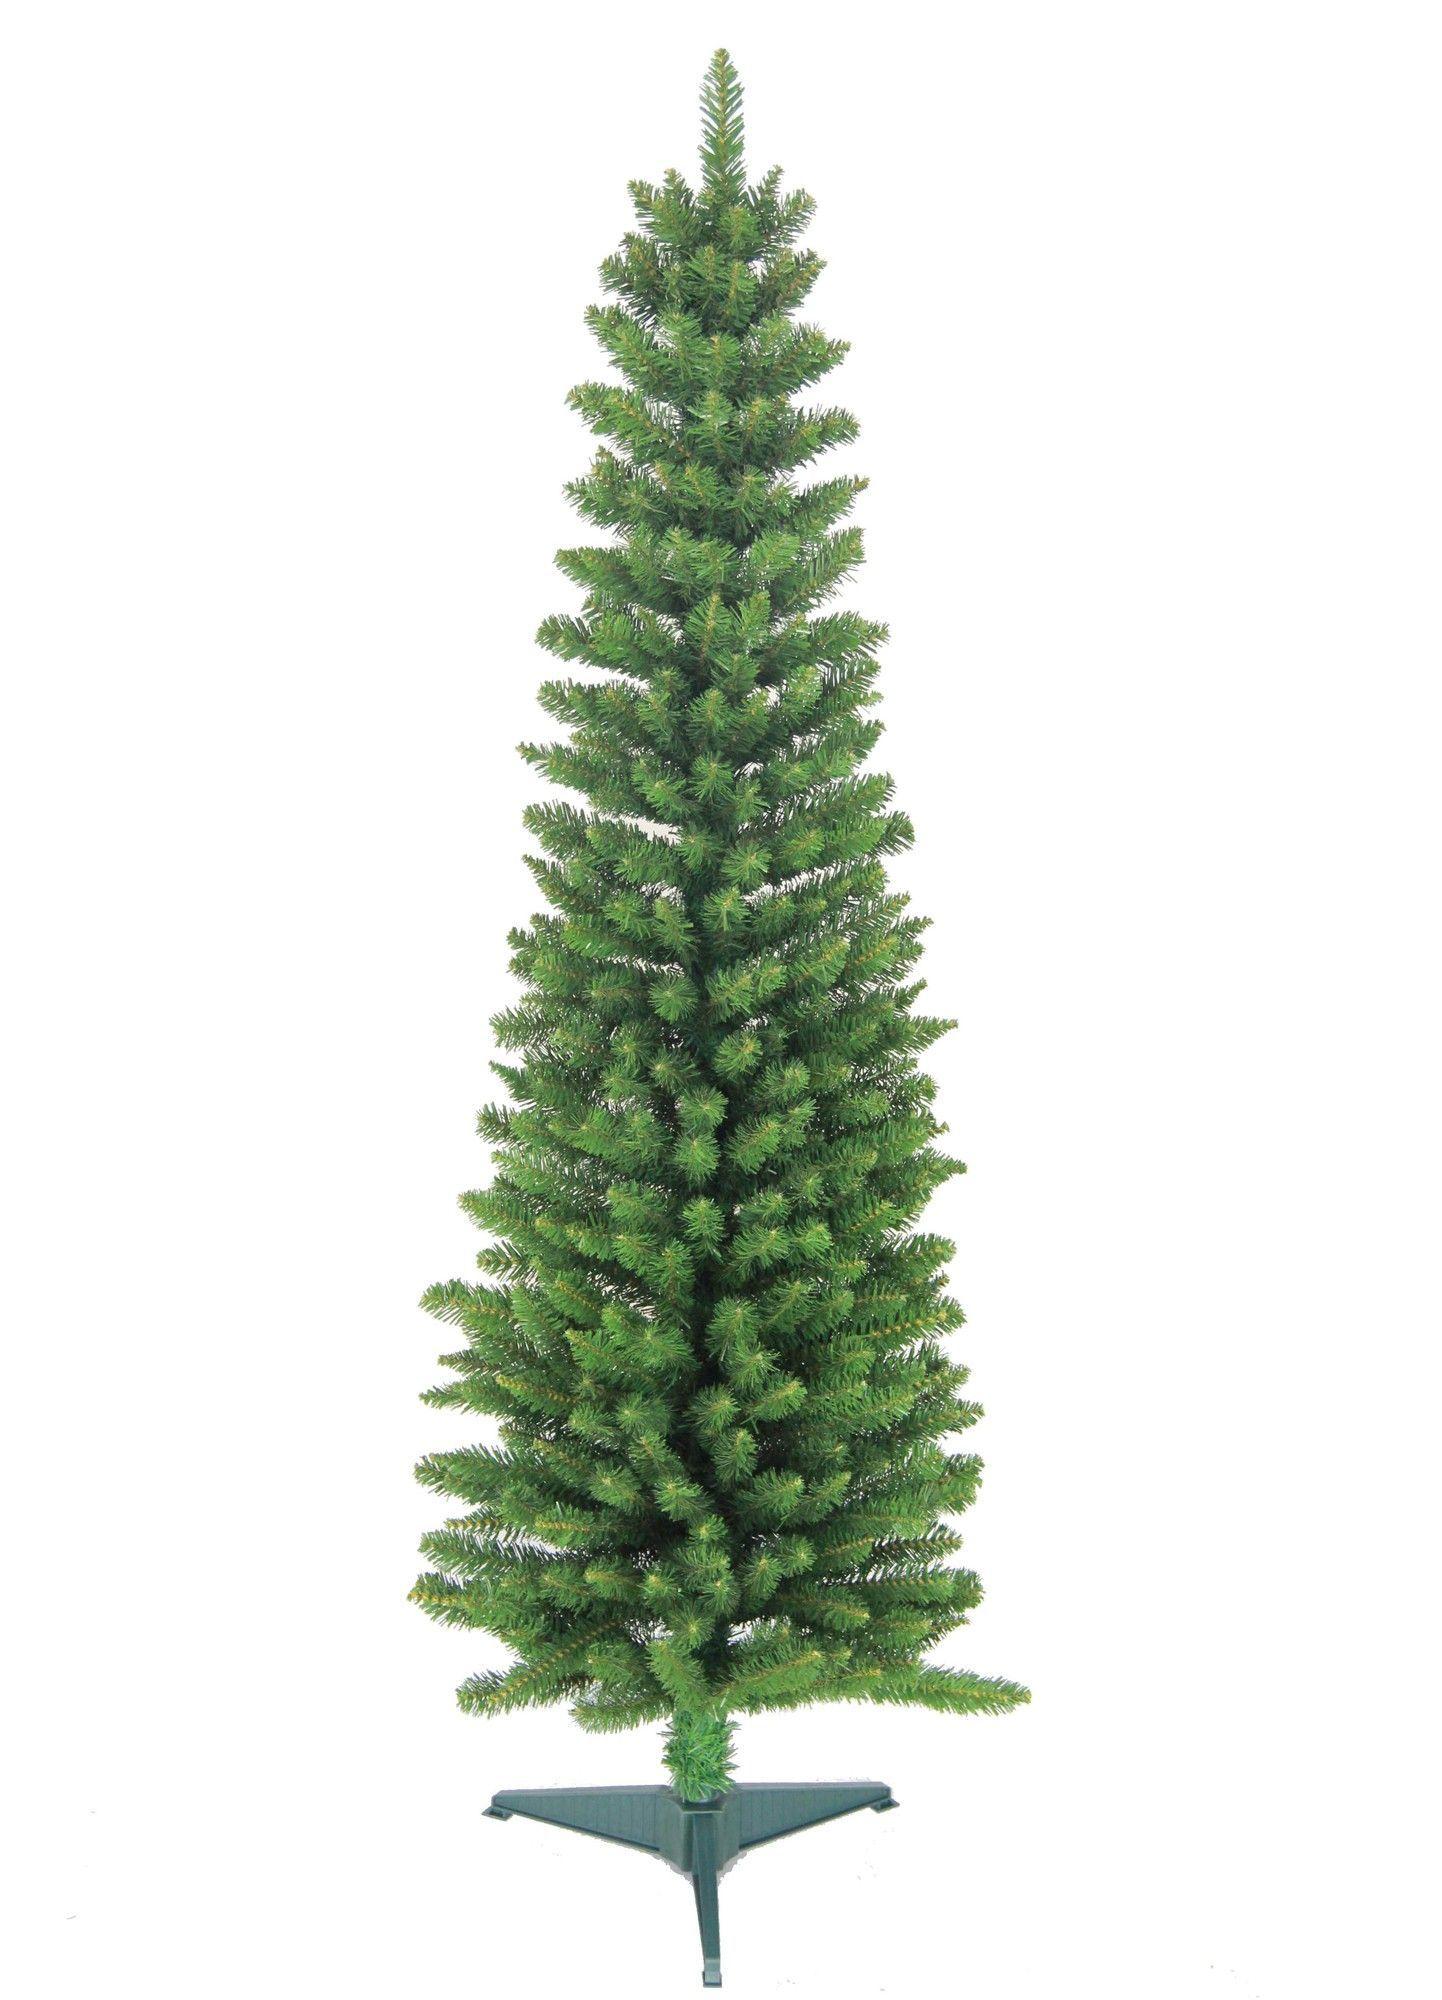 6 Green Pencil Artificial Christmas Tree